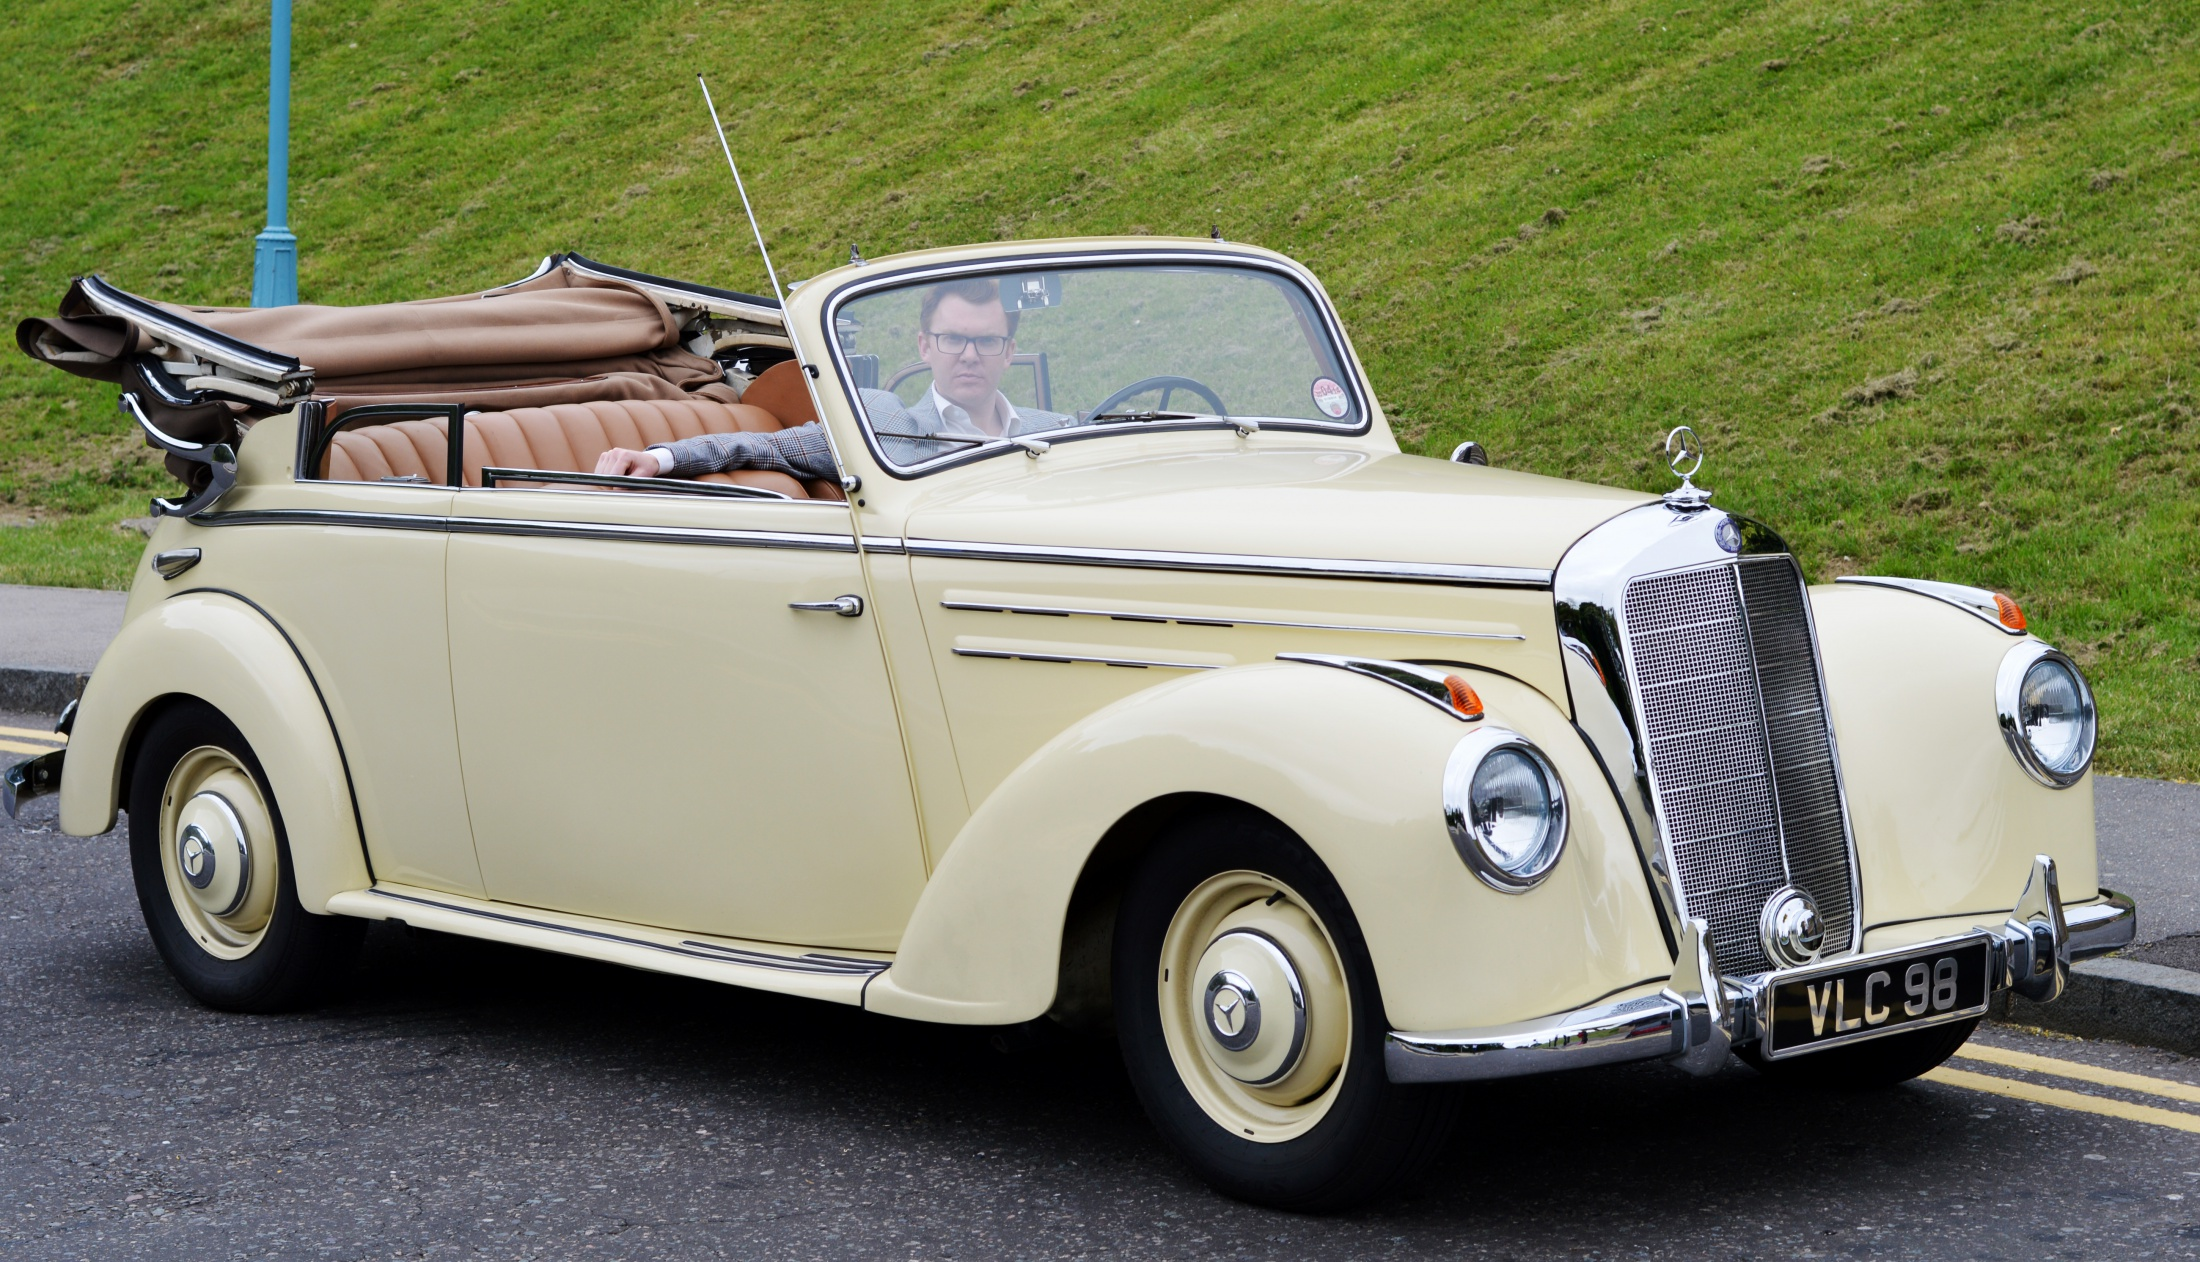 1950s mercedes convertible for sale fred shearer. Black Bedroom Furniture Sets. Home Design Ideas